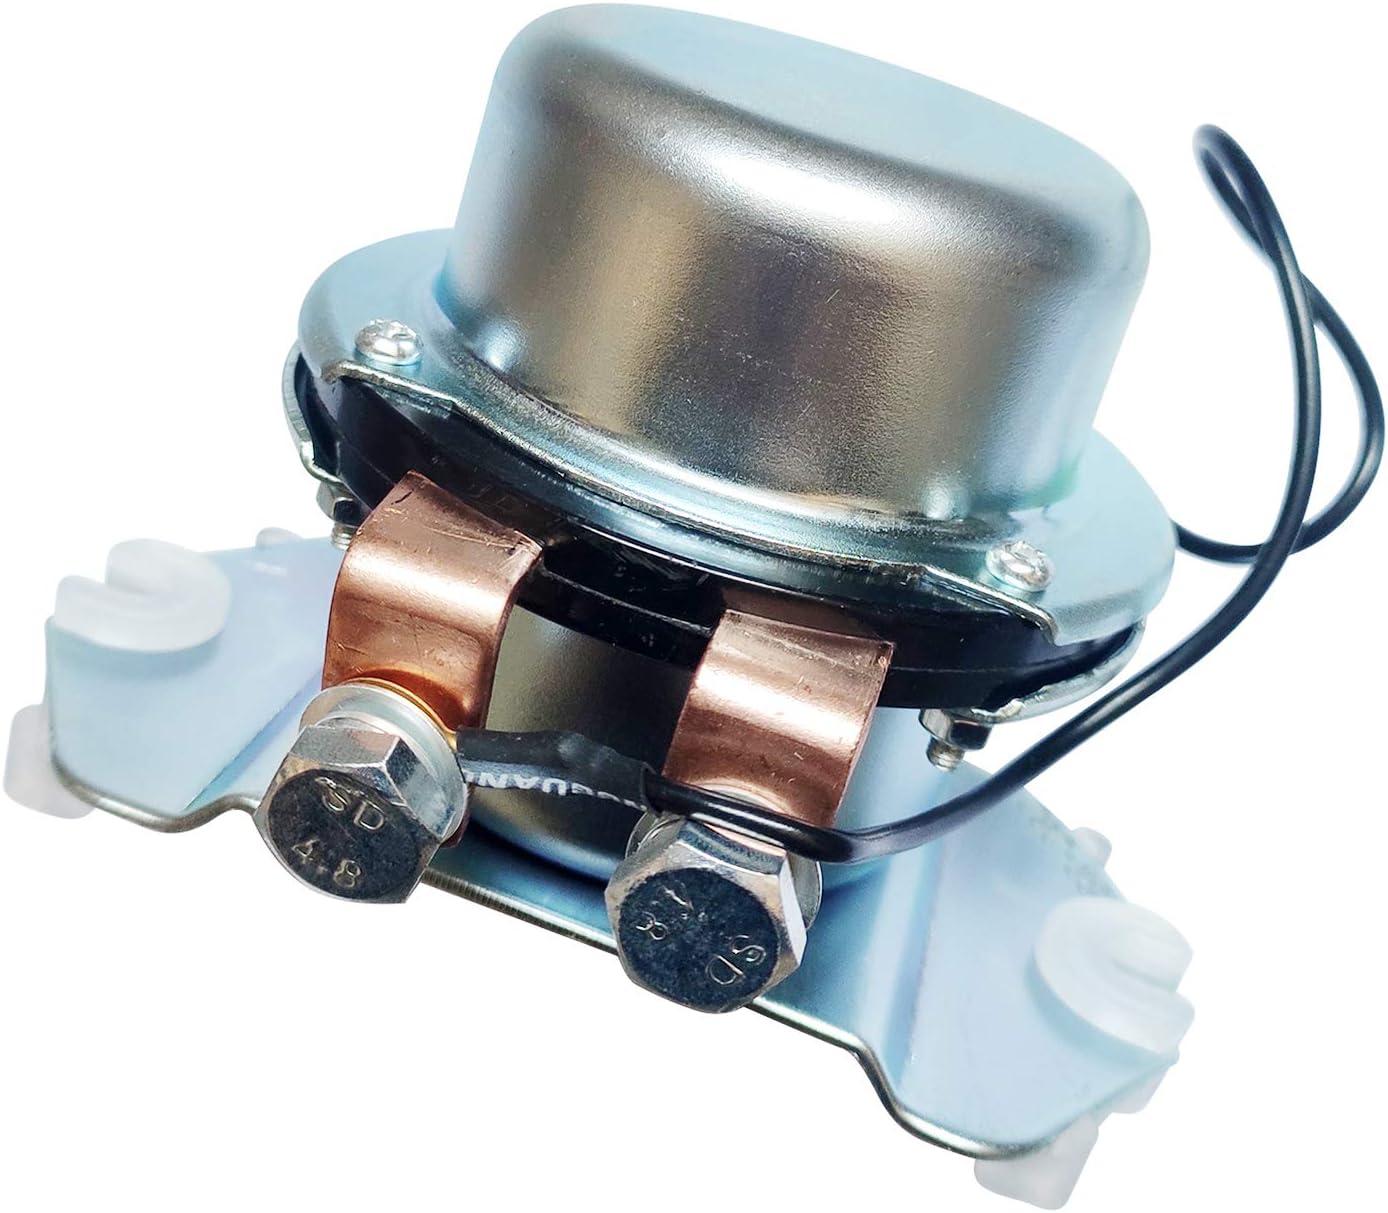 KRRK-parts 通信販売 24V Battery Relay AT154229 John fits for Deere 当店は最高な サービスを提供します Loader